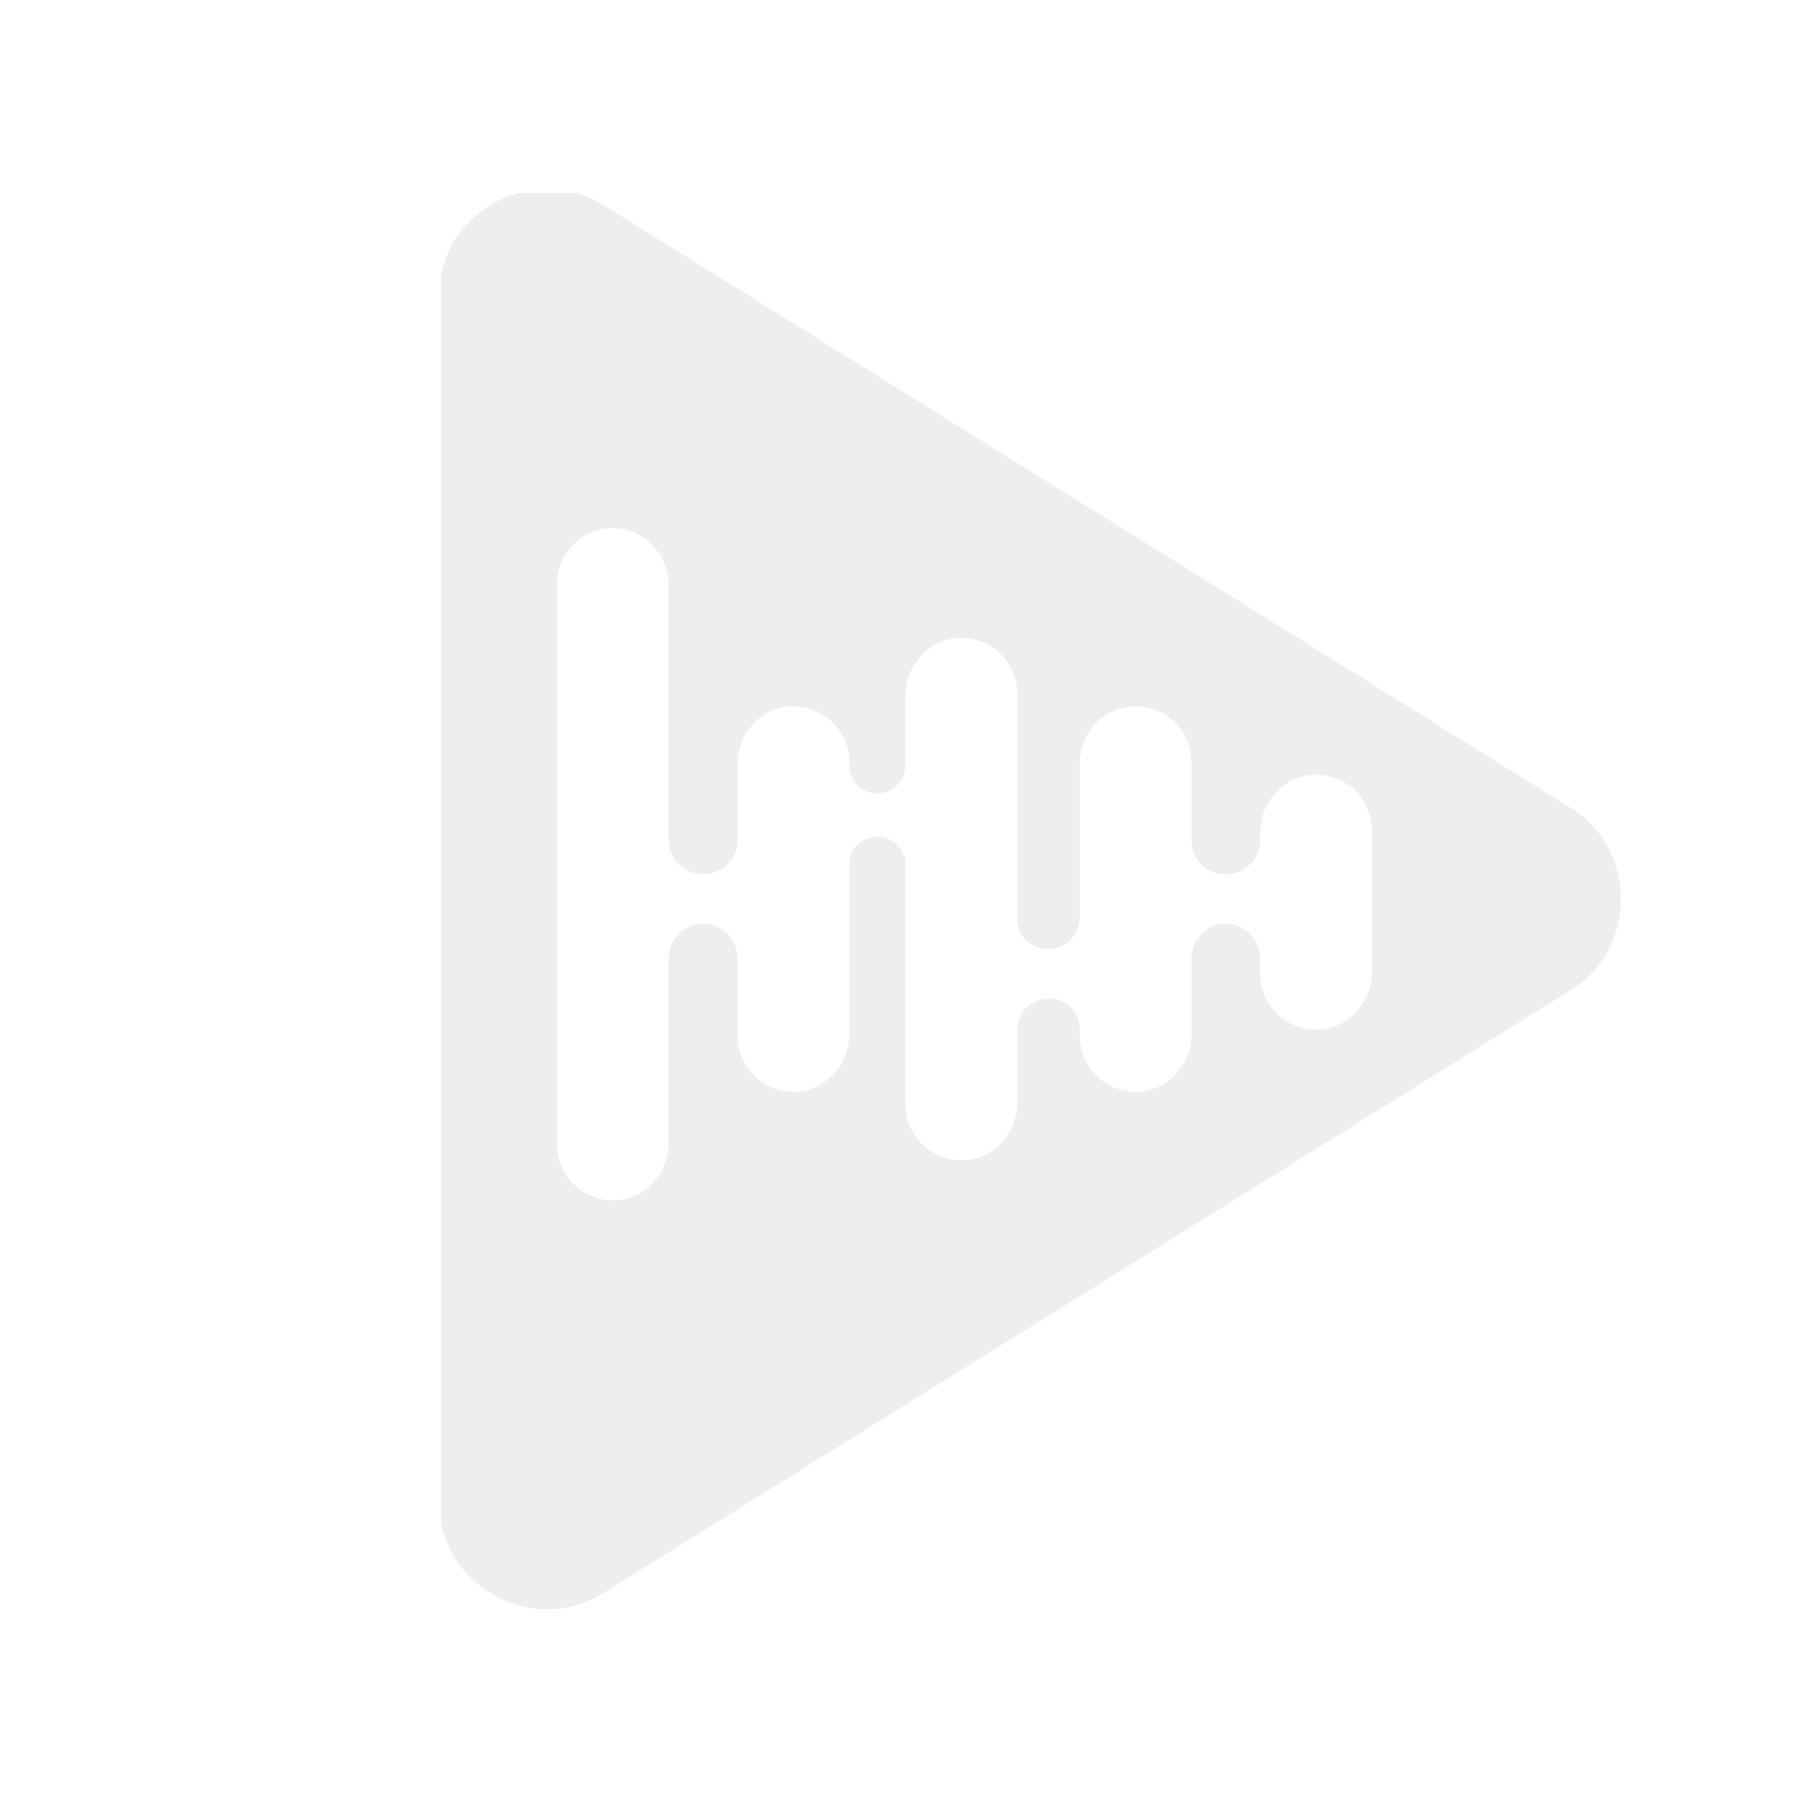 Grandview 148630 - Lerret Cyber, 16:9, 234x132, Manuelt 106